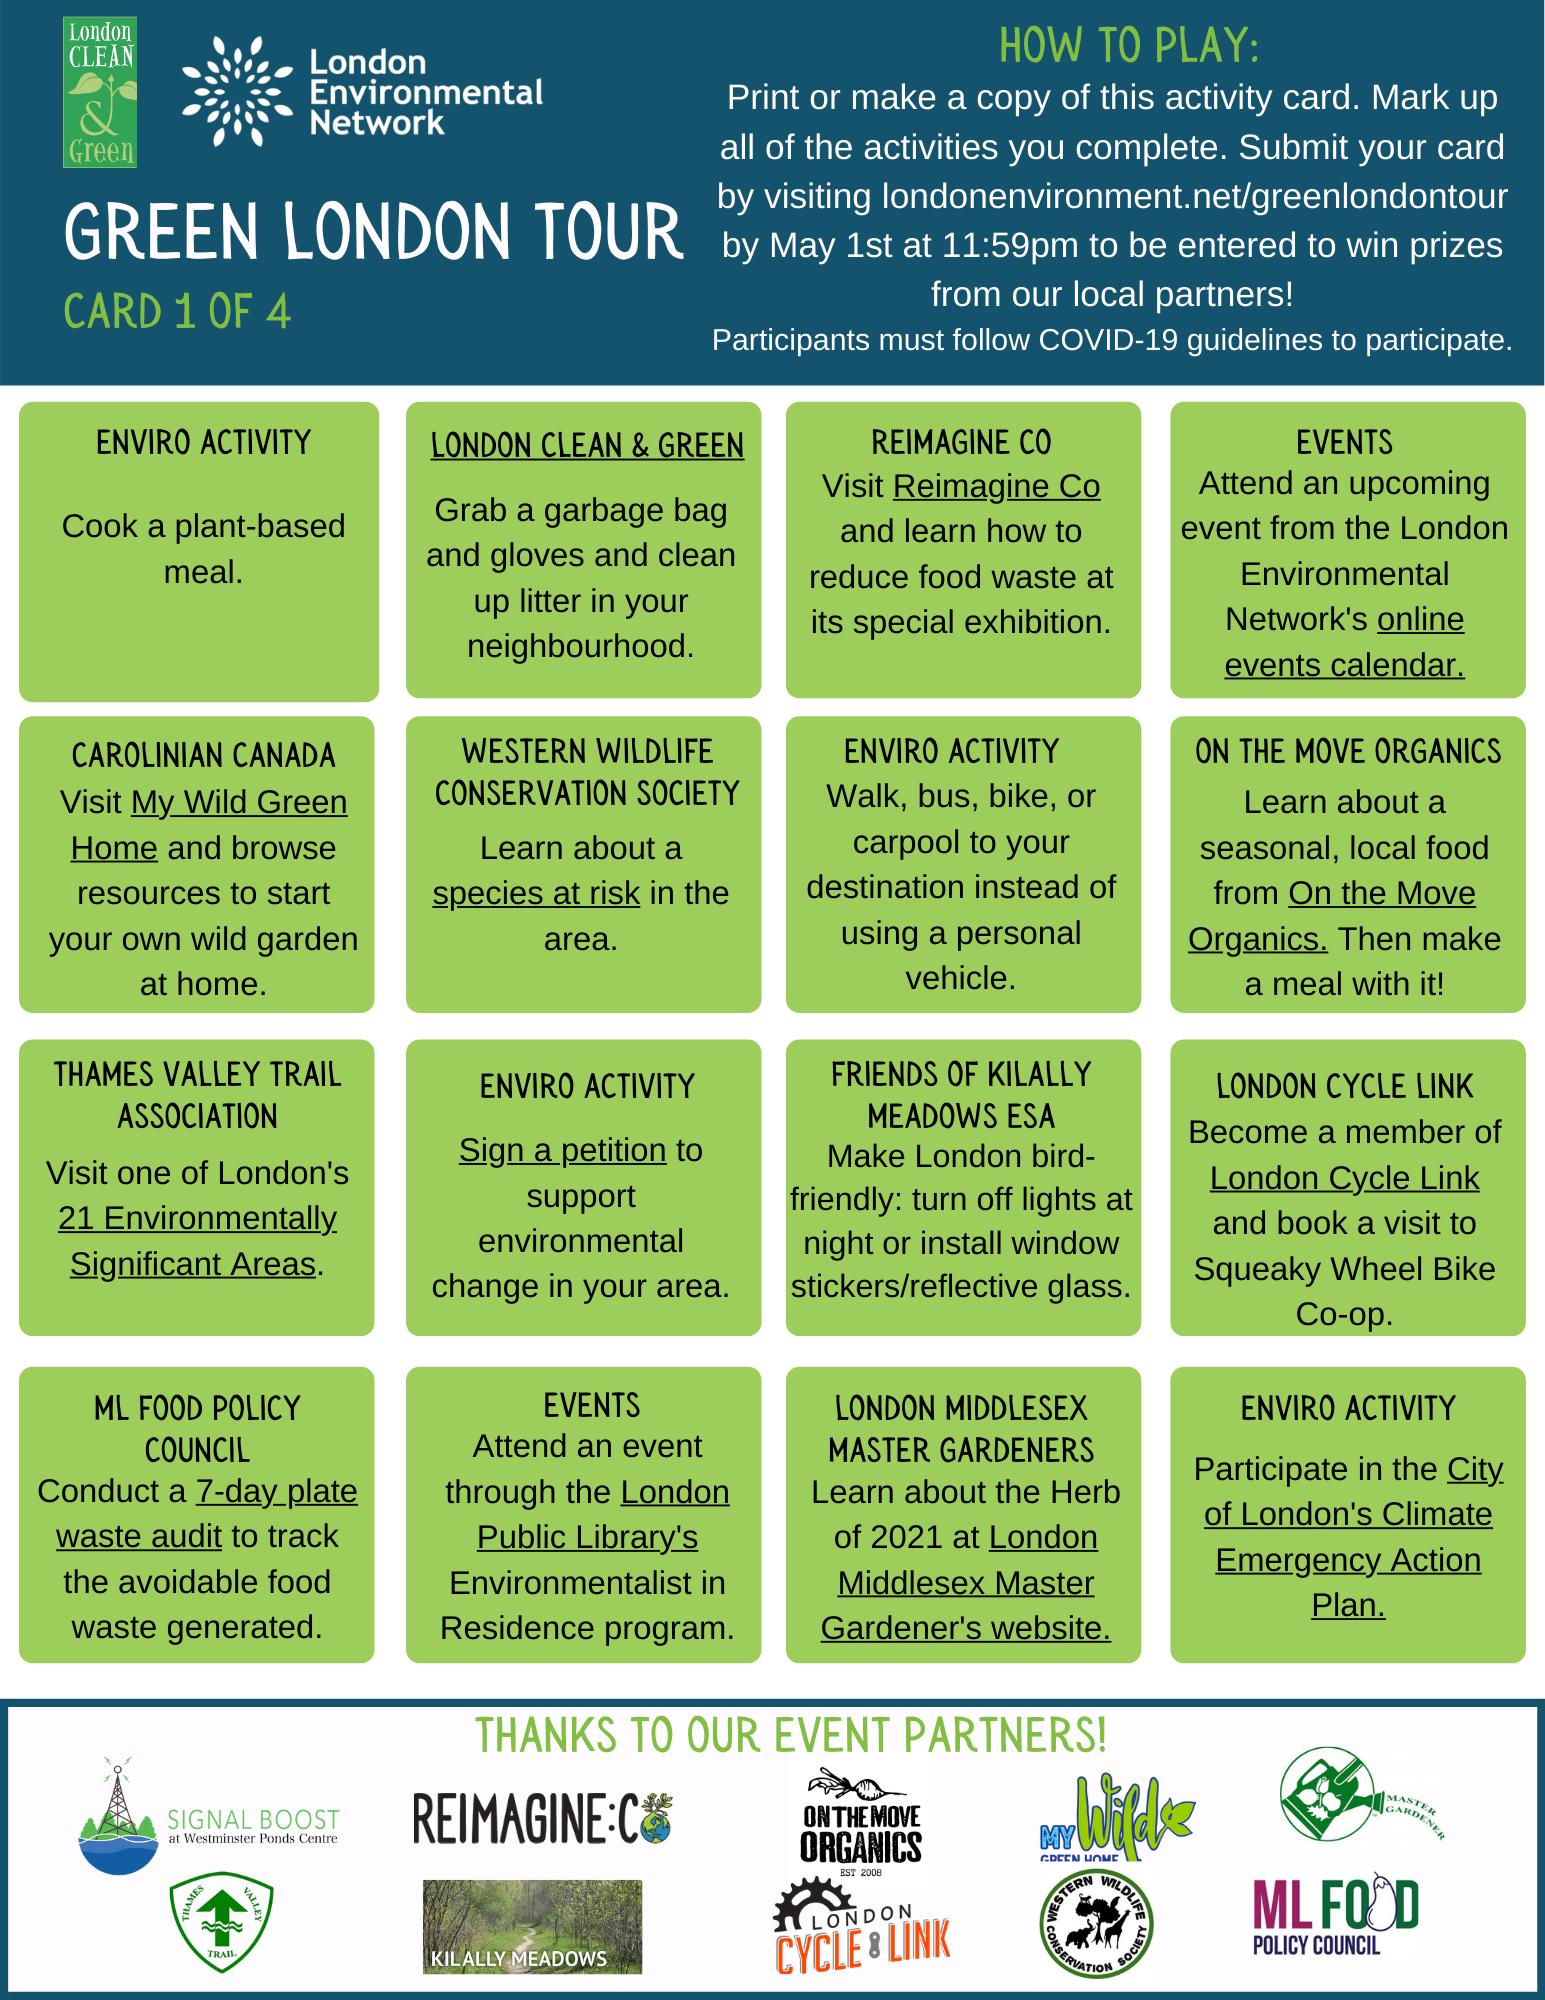 Green London Tour Card 1